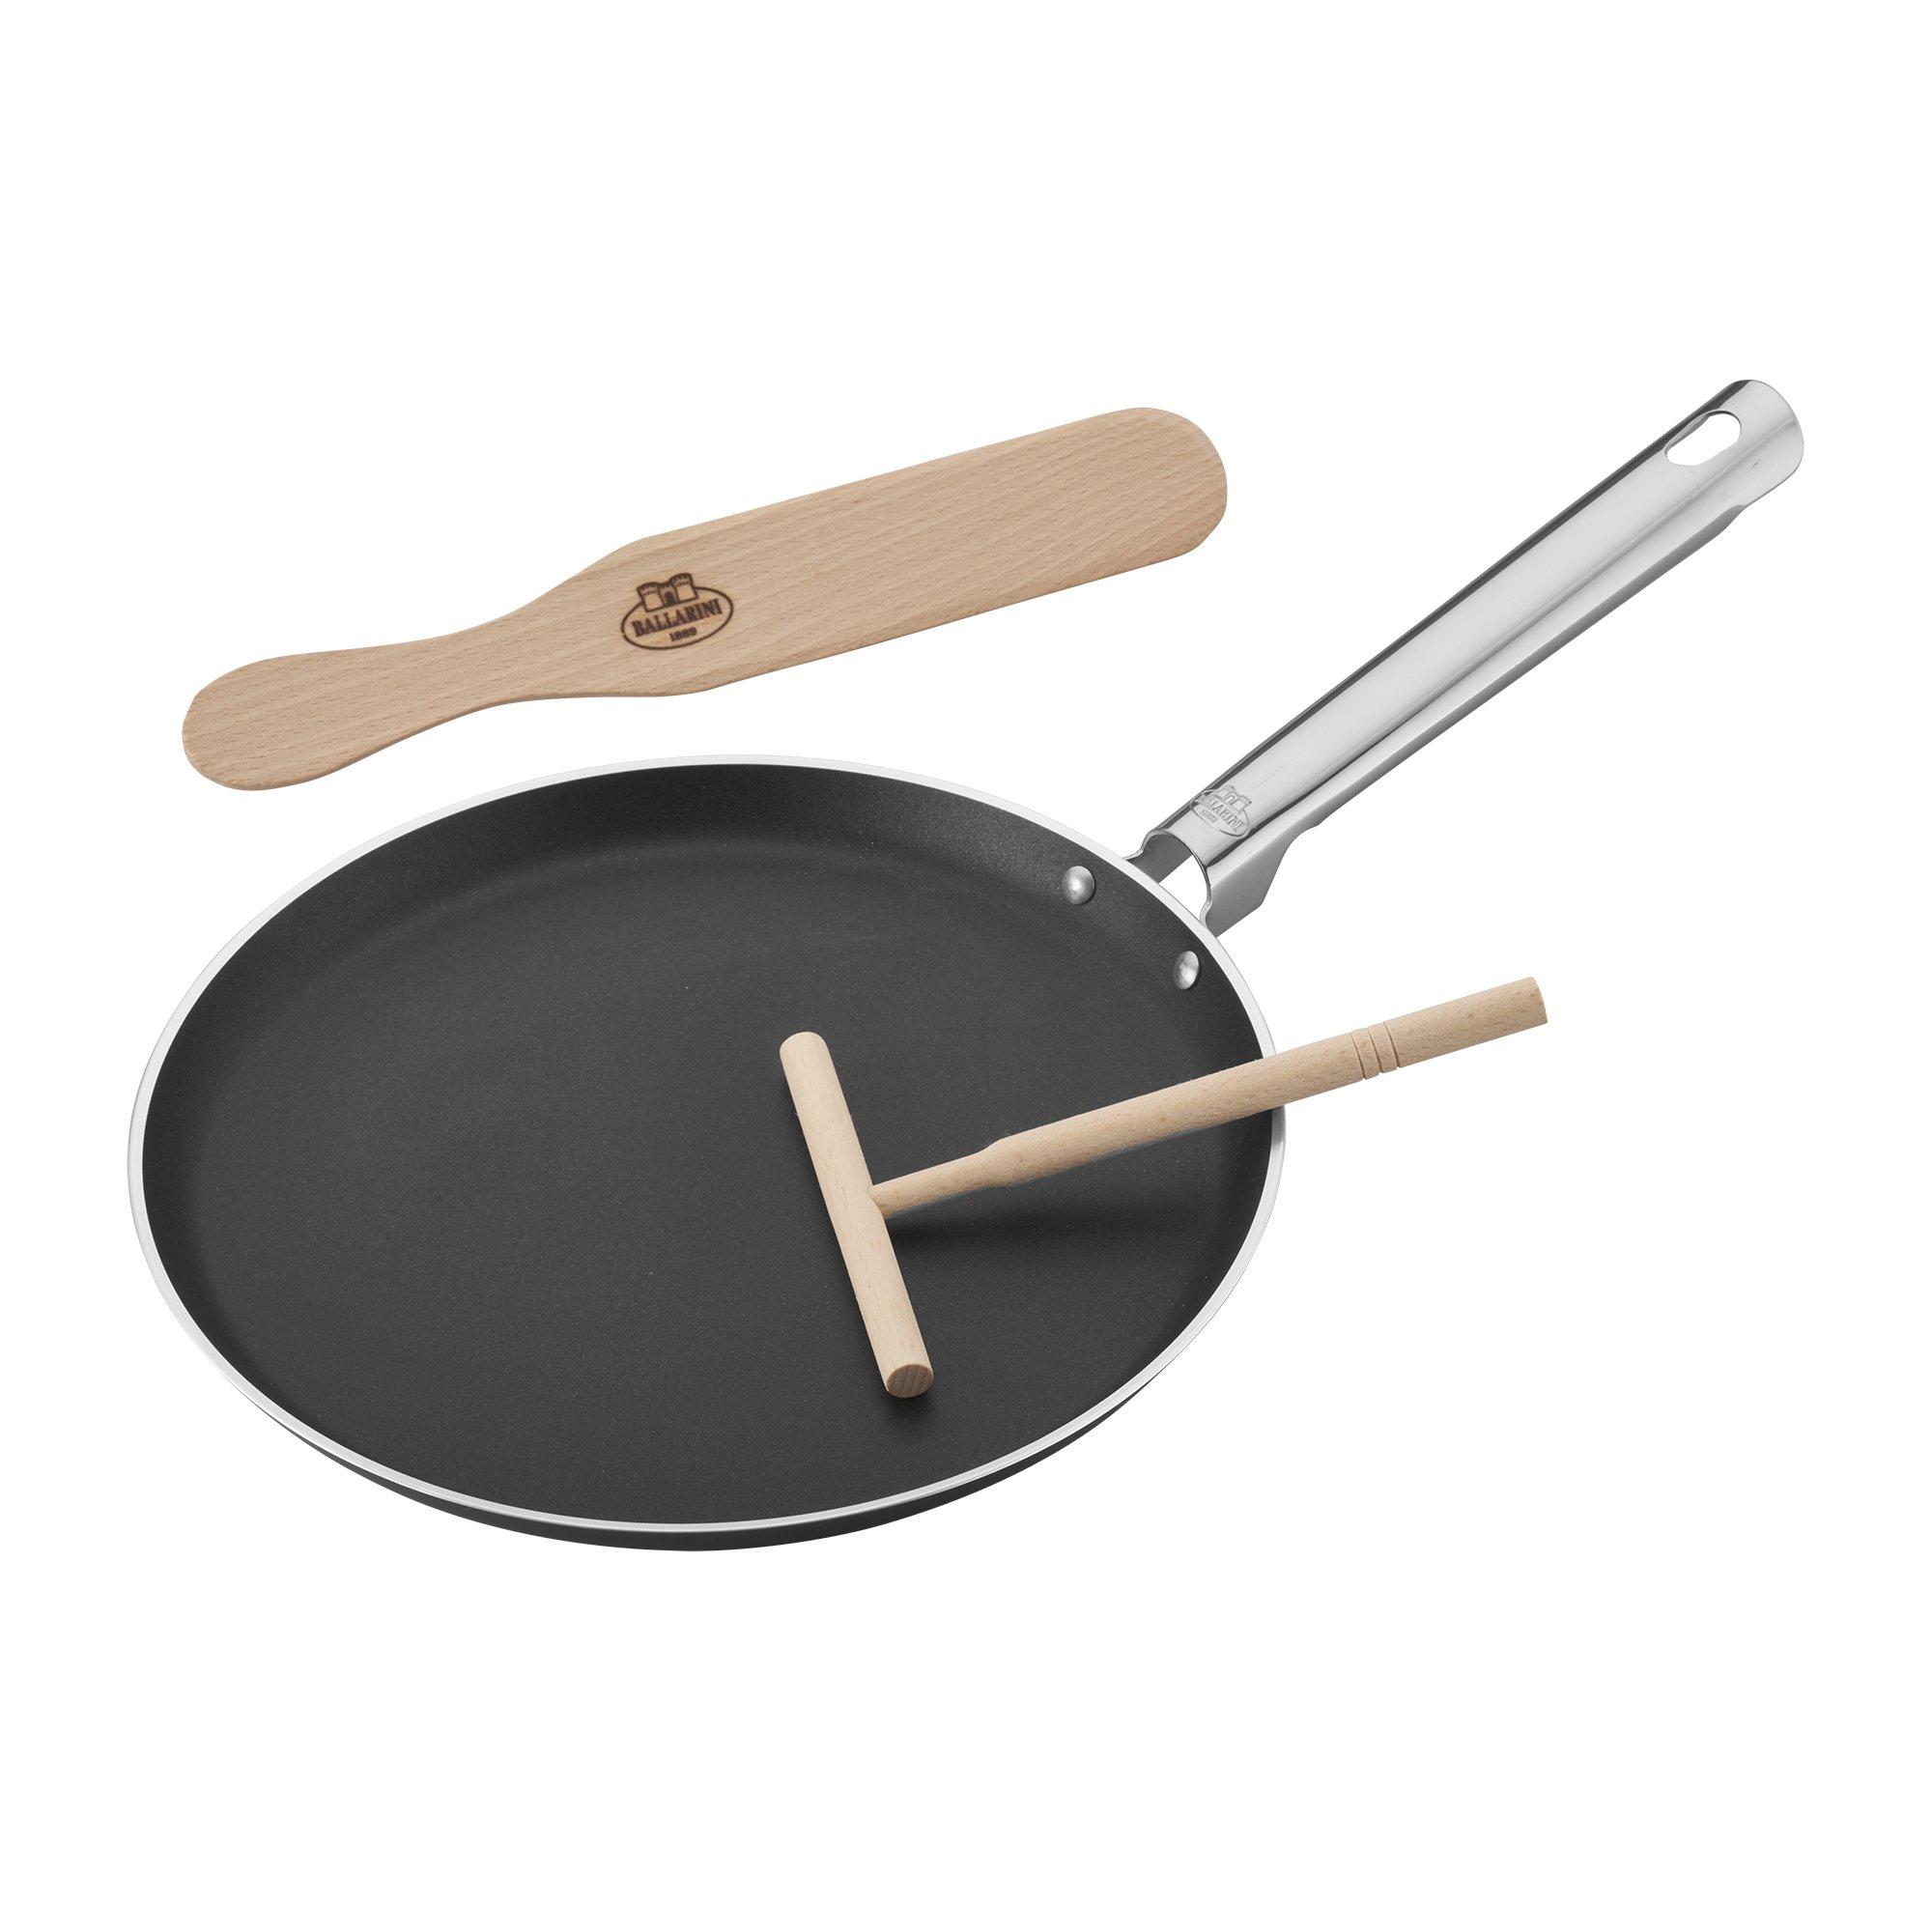 Ballarini 75000-663 cookin'Italy Crepe Pan Set, 10.5-inch, Black by BALLARINI